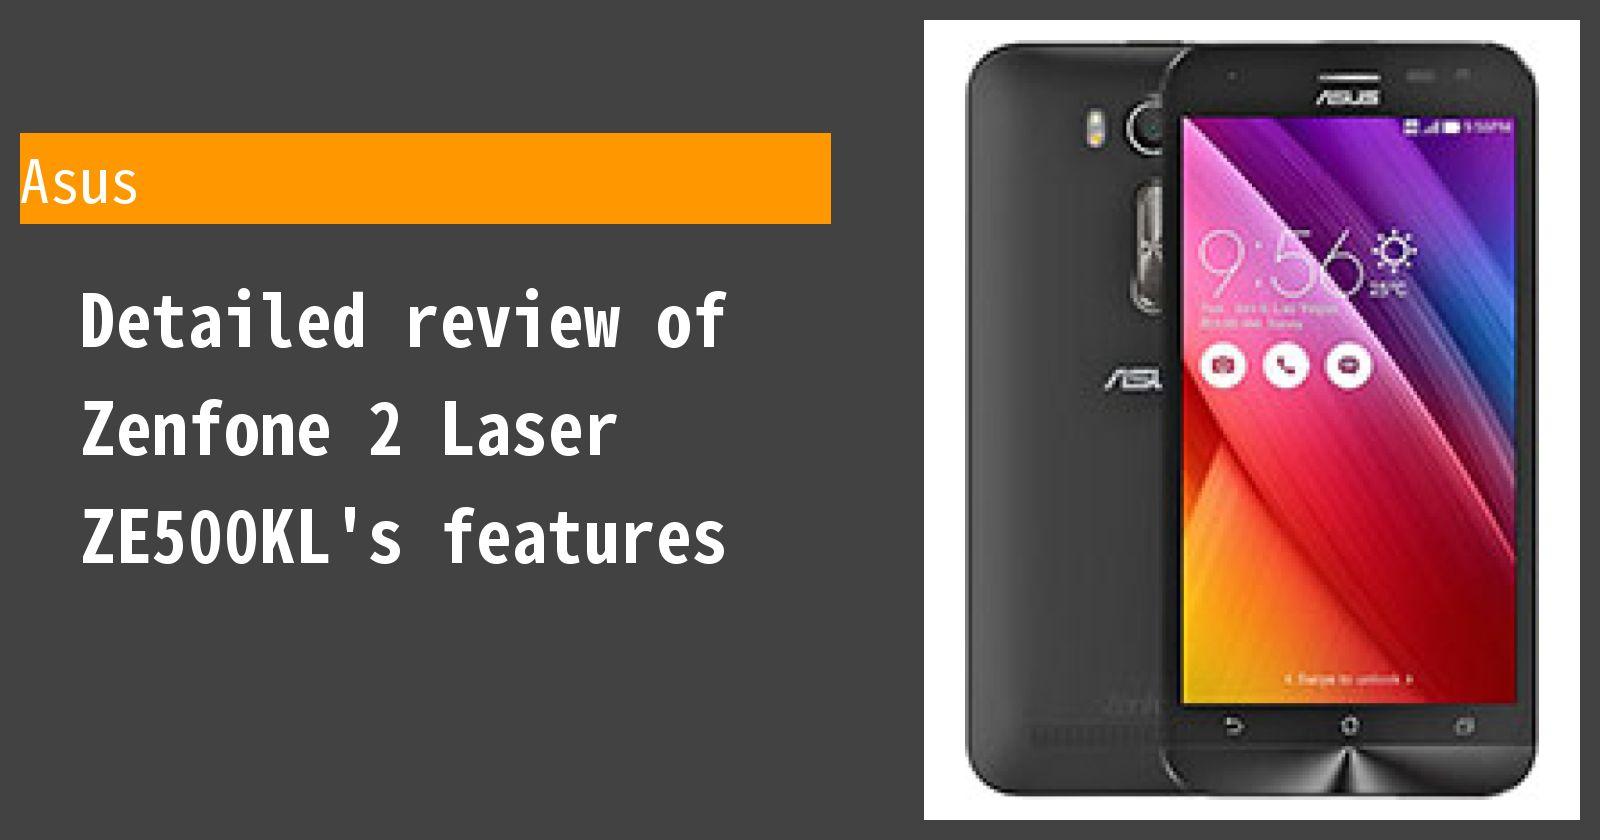 Detailed review of Zenfone 2 Laser ZE500KL's features